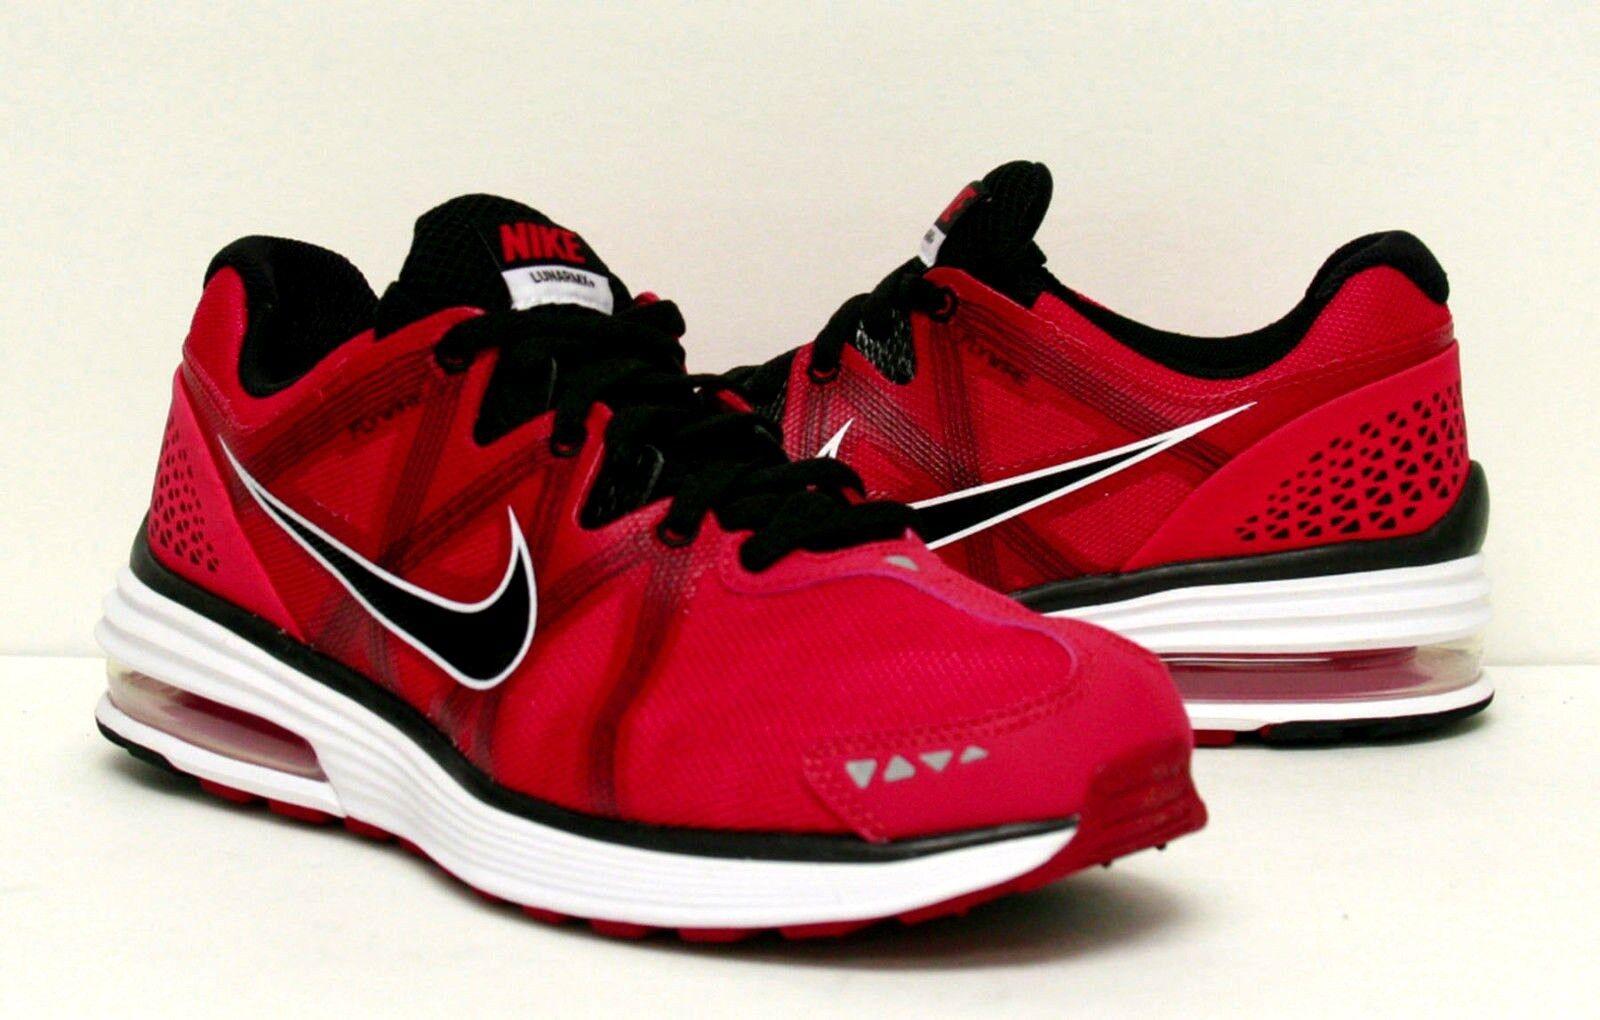 Nike Women's LUNARMX+ 415323-601 Athletic / Training Shoes  Comfortable Seasonal clearance sale